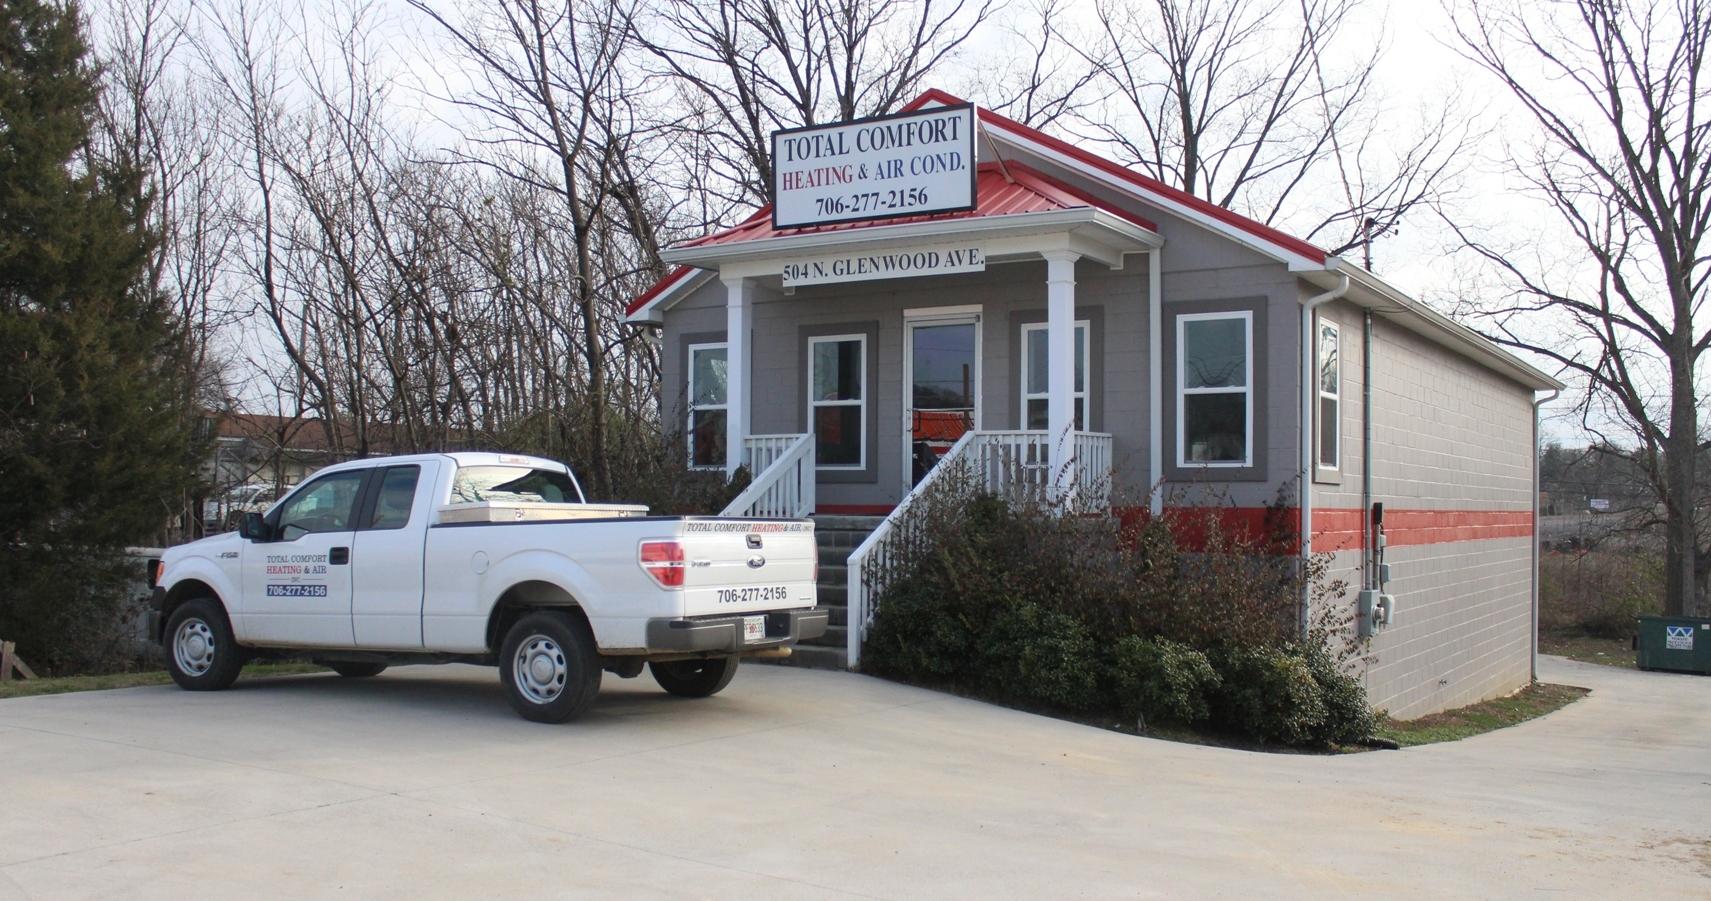 Family satisfied with air conditioning contractors in Dalton, GA